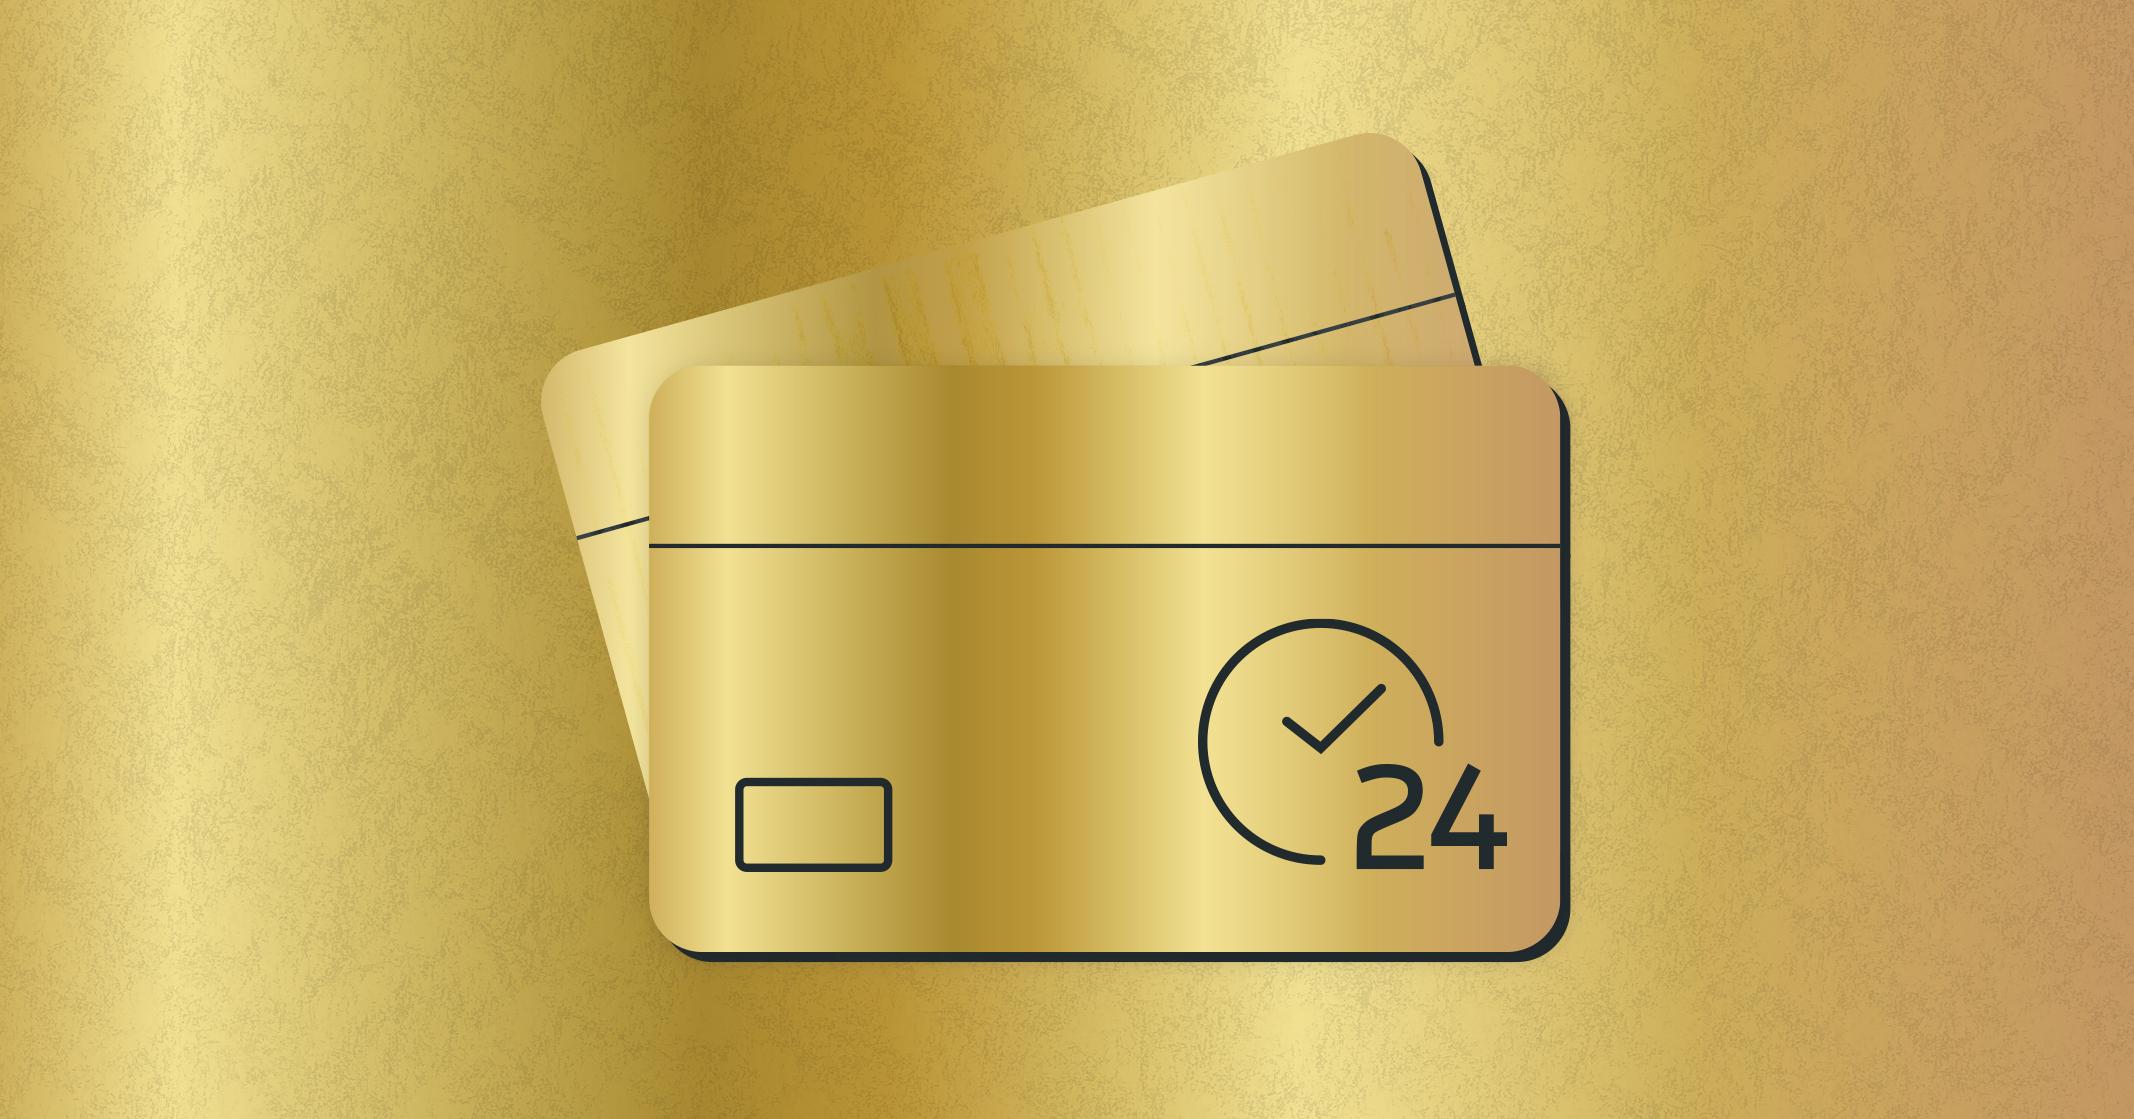 cp026_abonos_24_gold.jpg.jpg